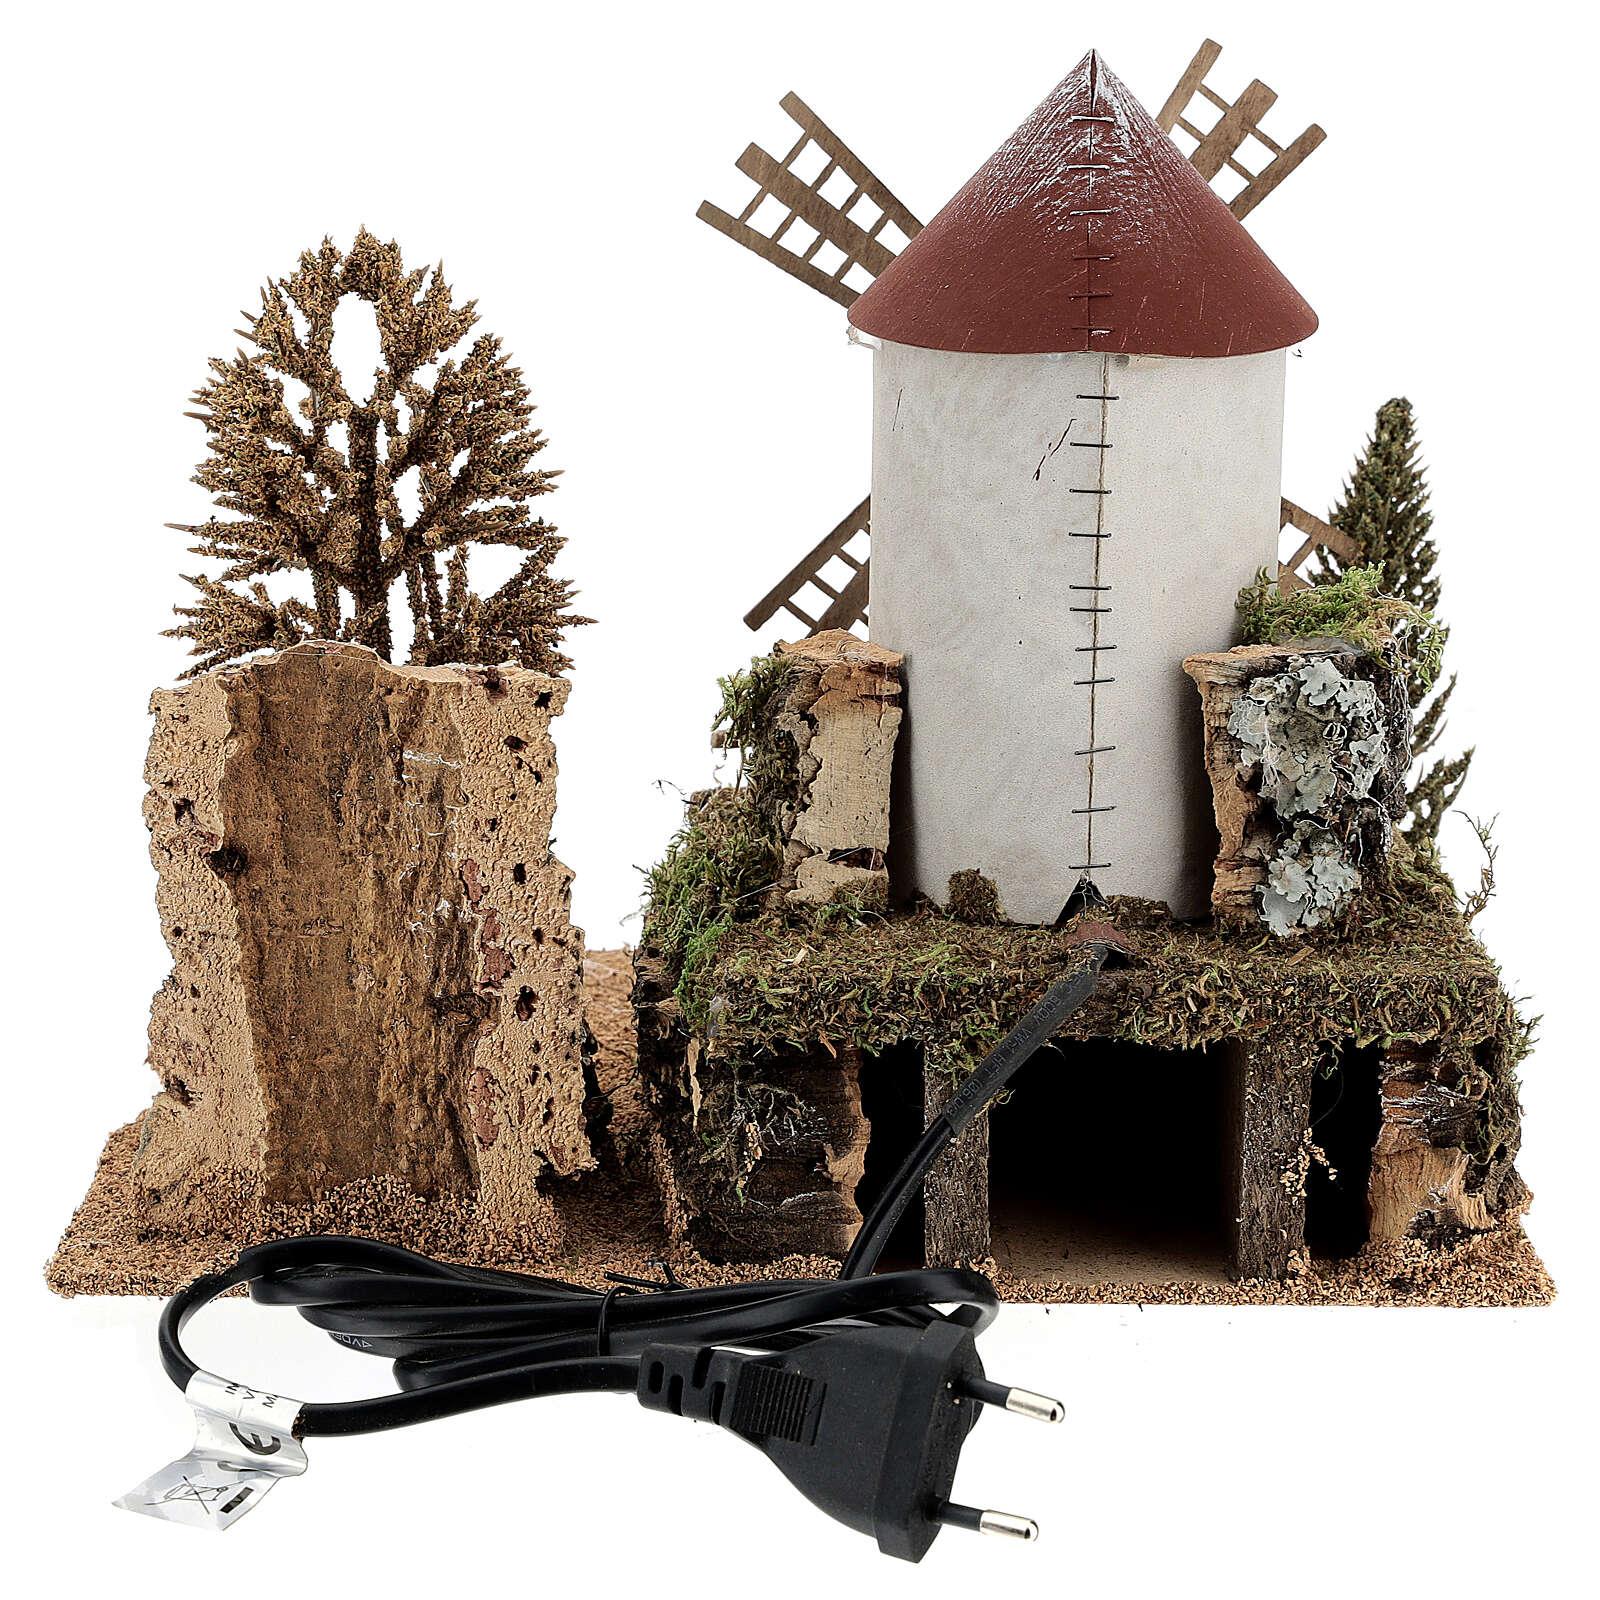 Landscape with working windmill 6-8 cm Nativity Scene 26x28x20 cm 4